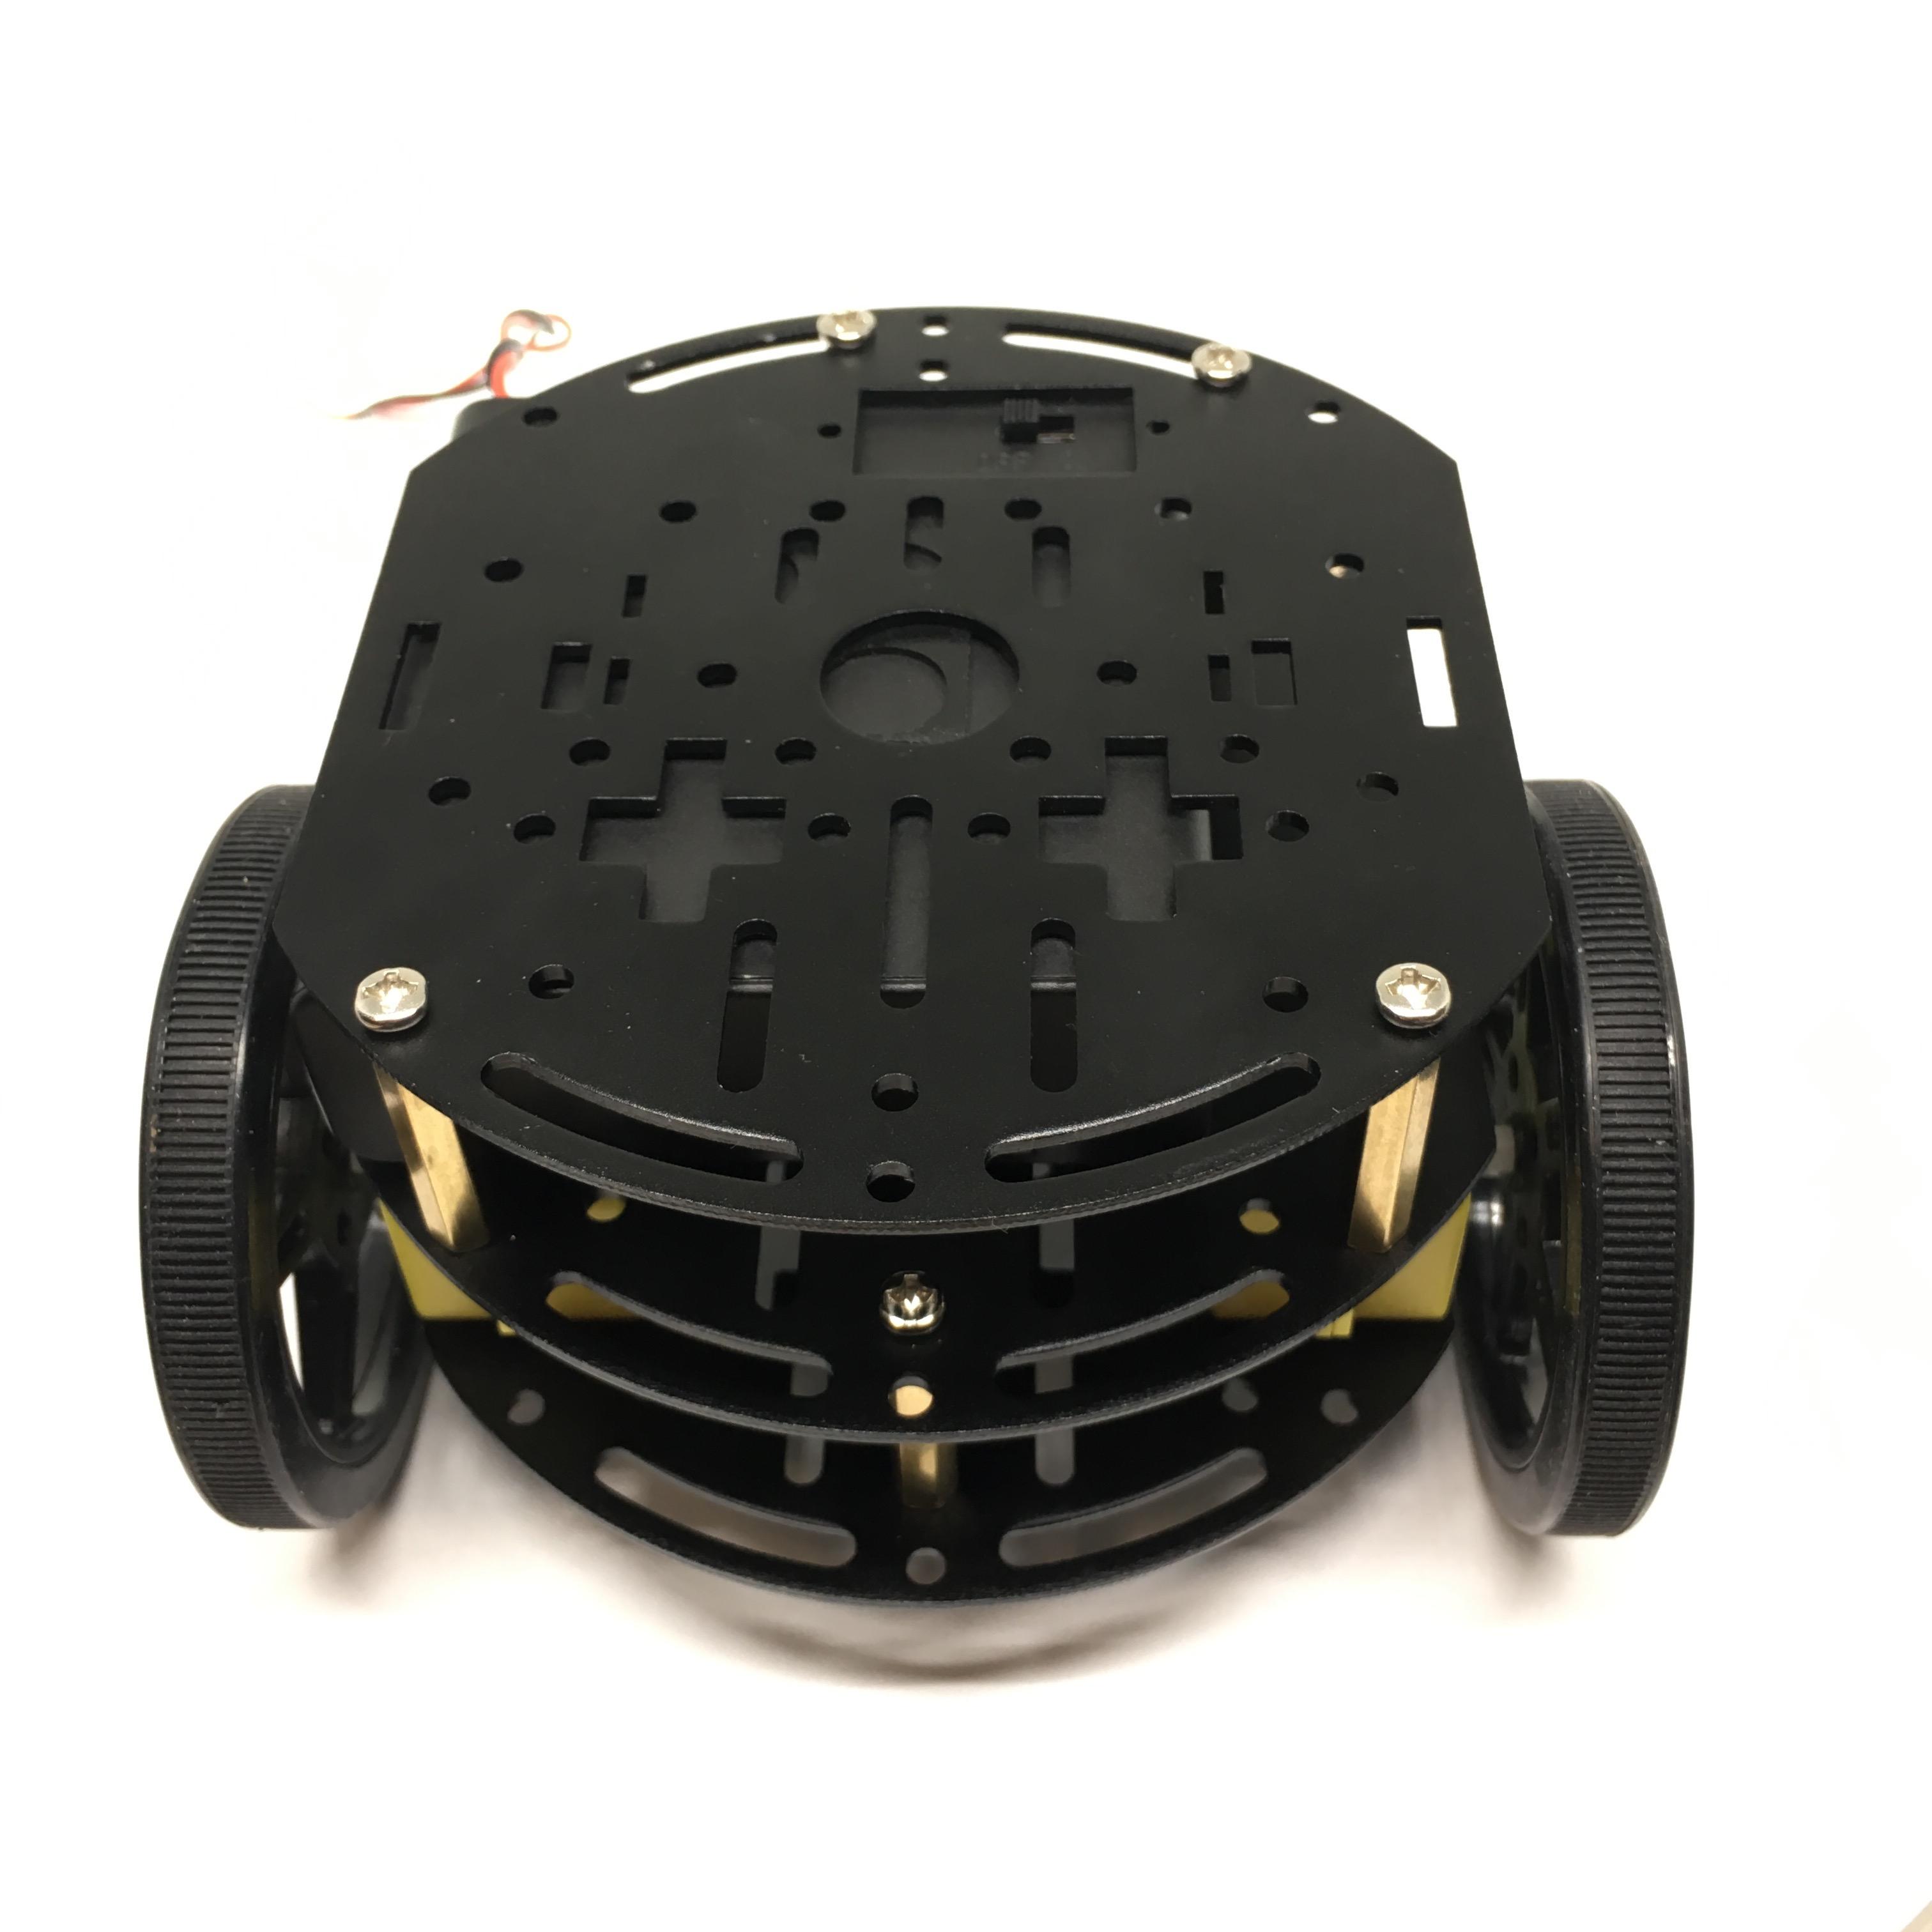 learn_arduino_robotics_IMG_0897.jpg